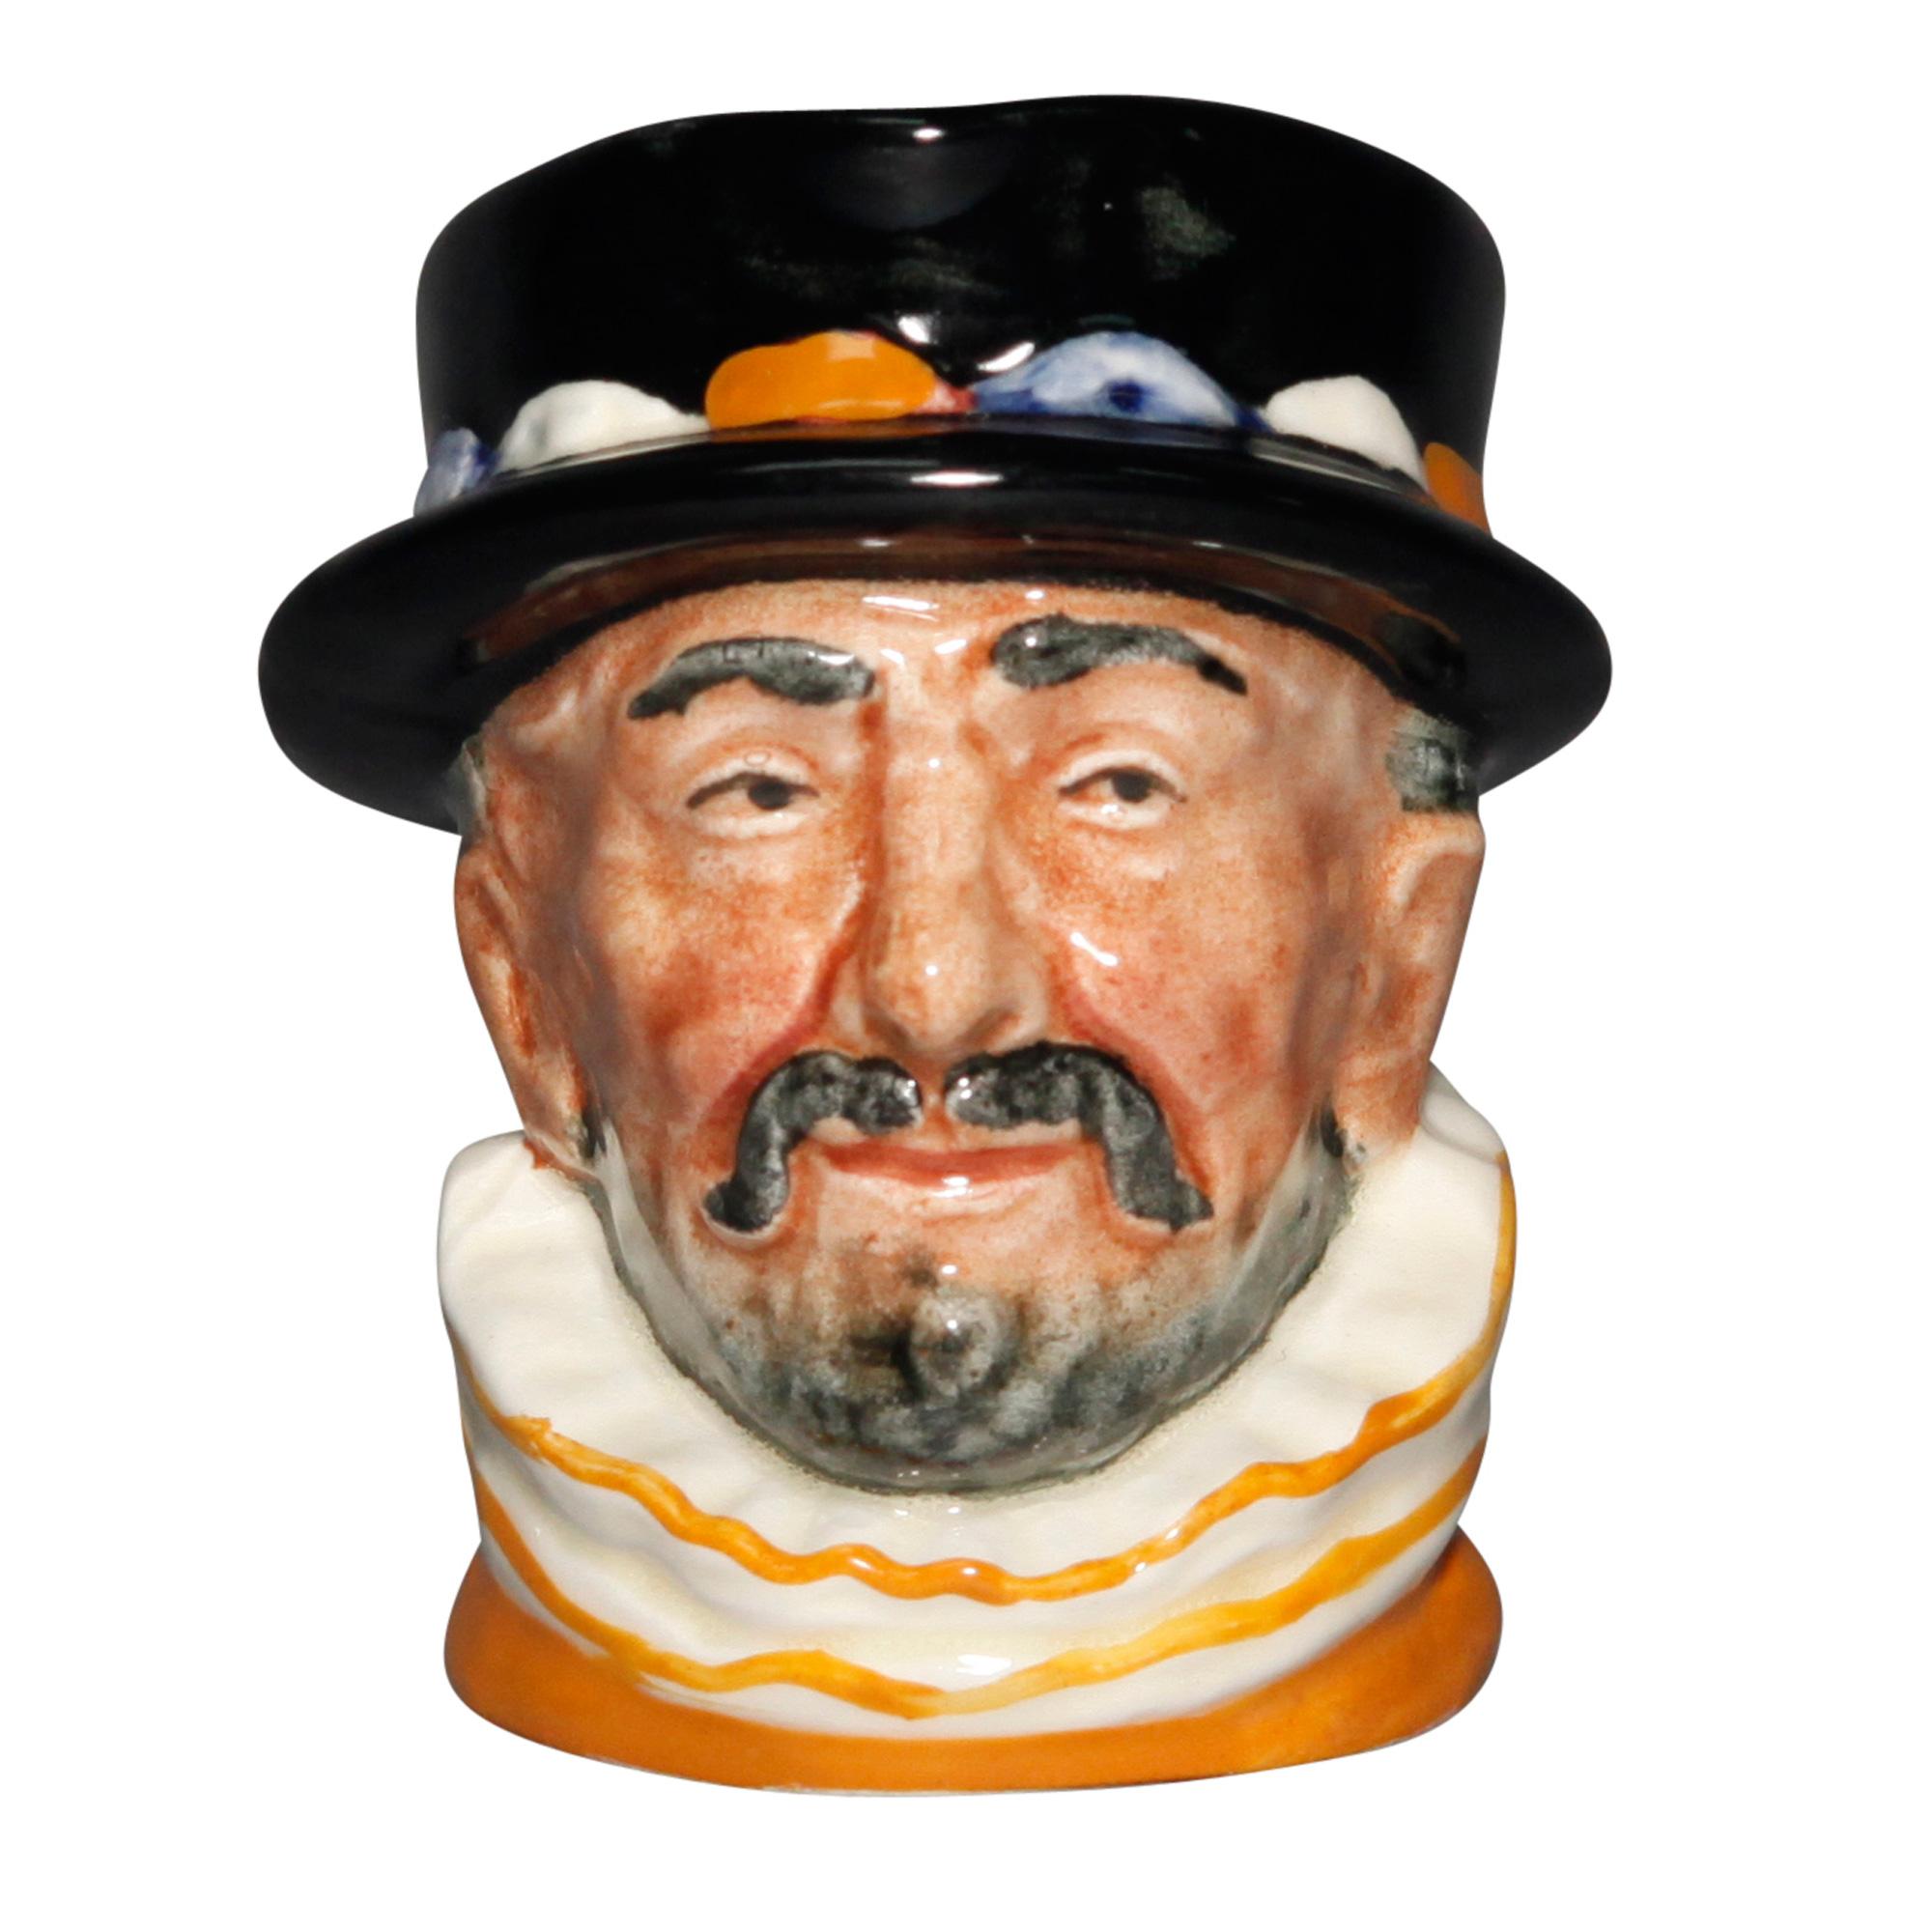 Beefeater - Color Variation Orange - Miniature - Royal Doulton Character Jug